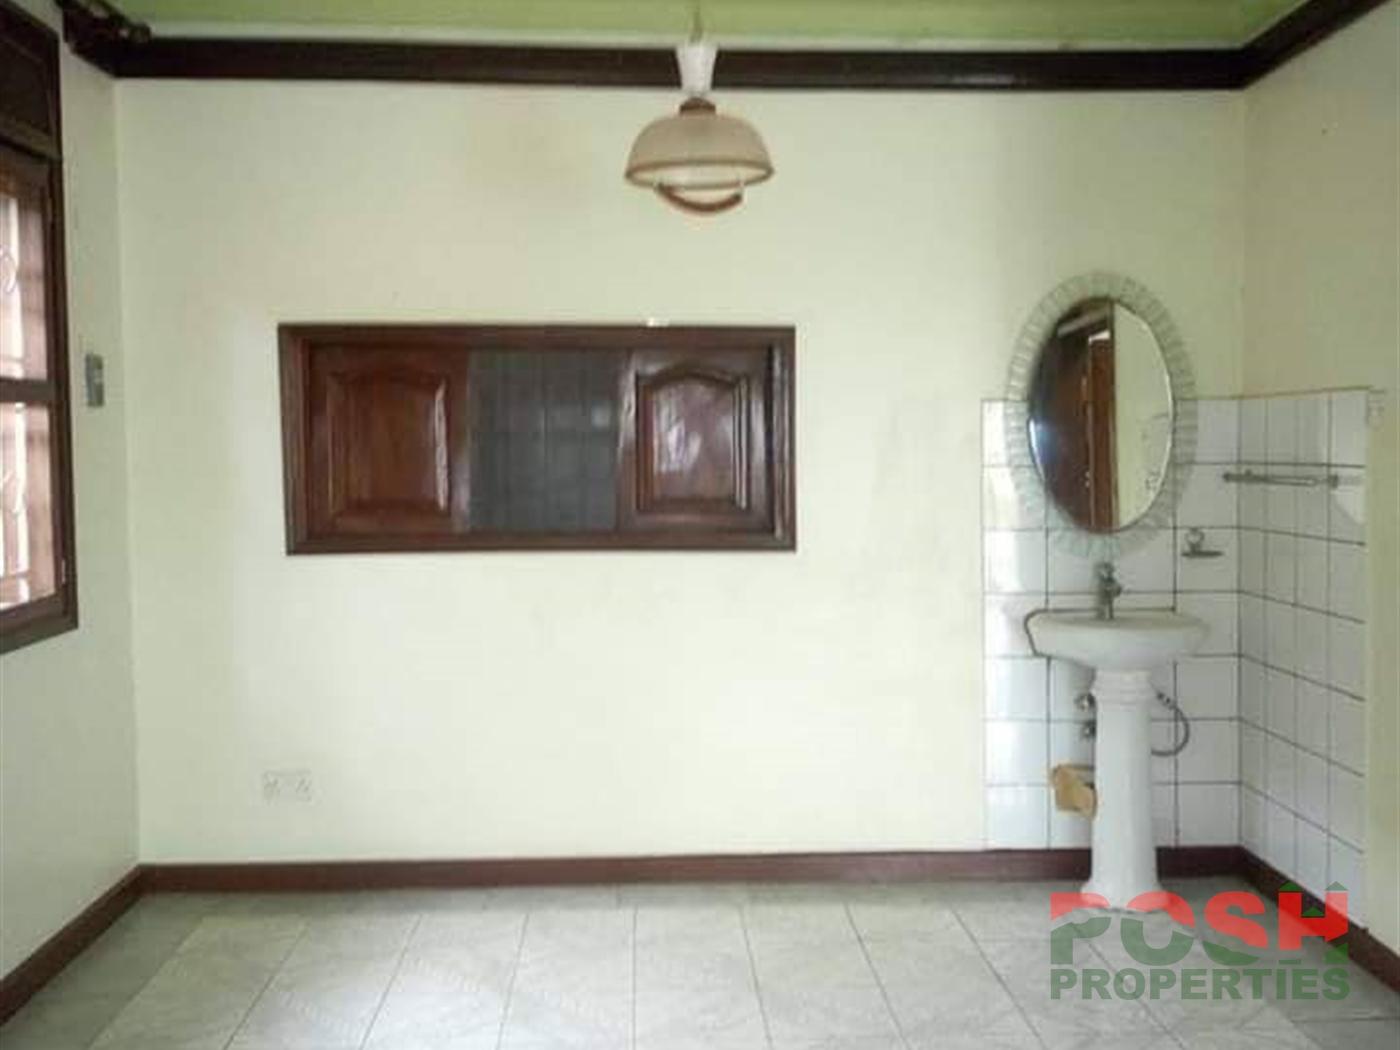 Mansion for sale in Bugolobi Kampala